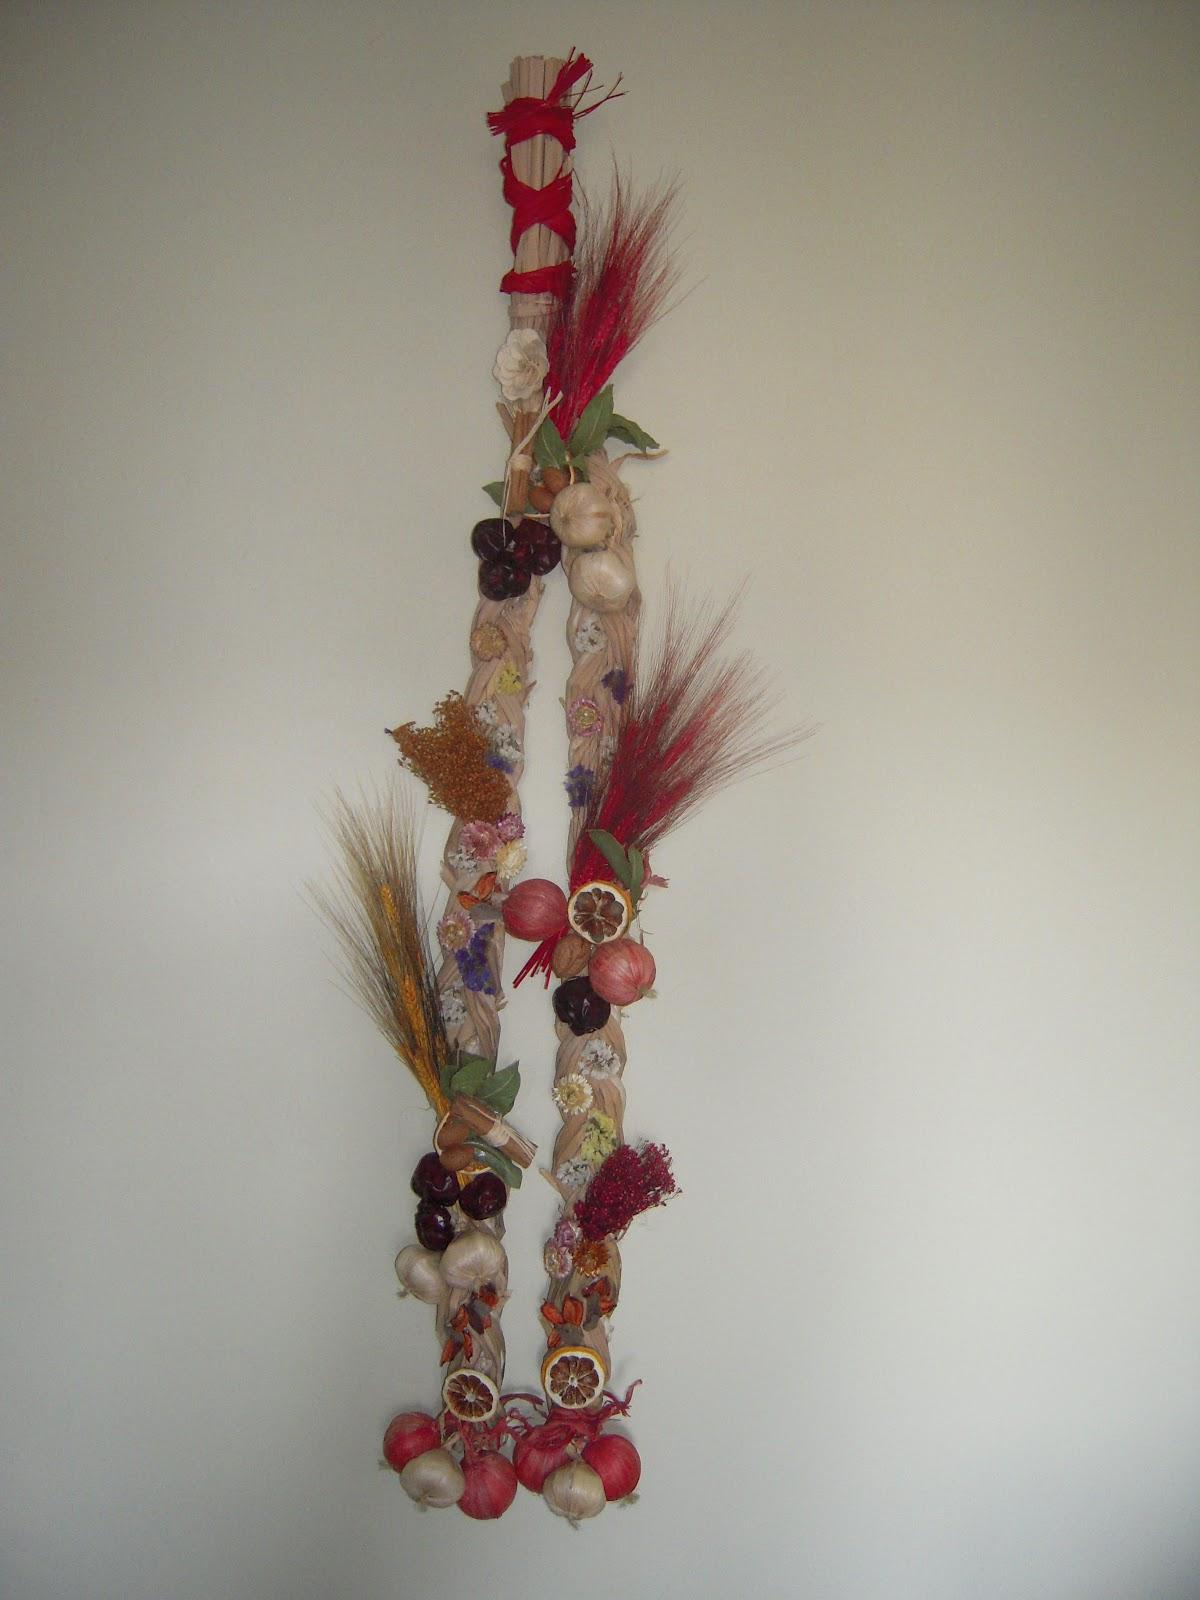 La casita de o nany o decoracion con flores secas - Adornos flores secas ...